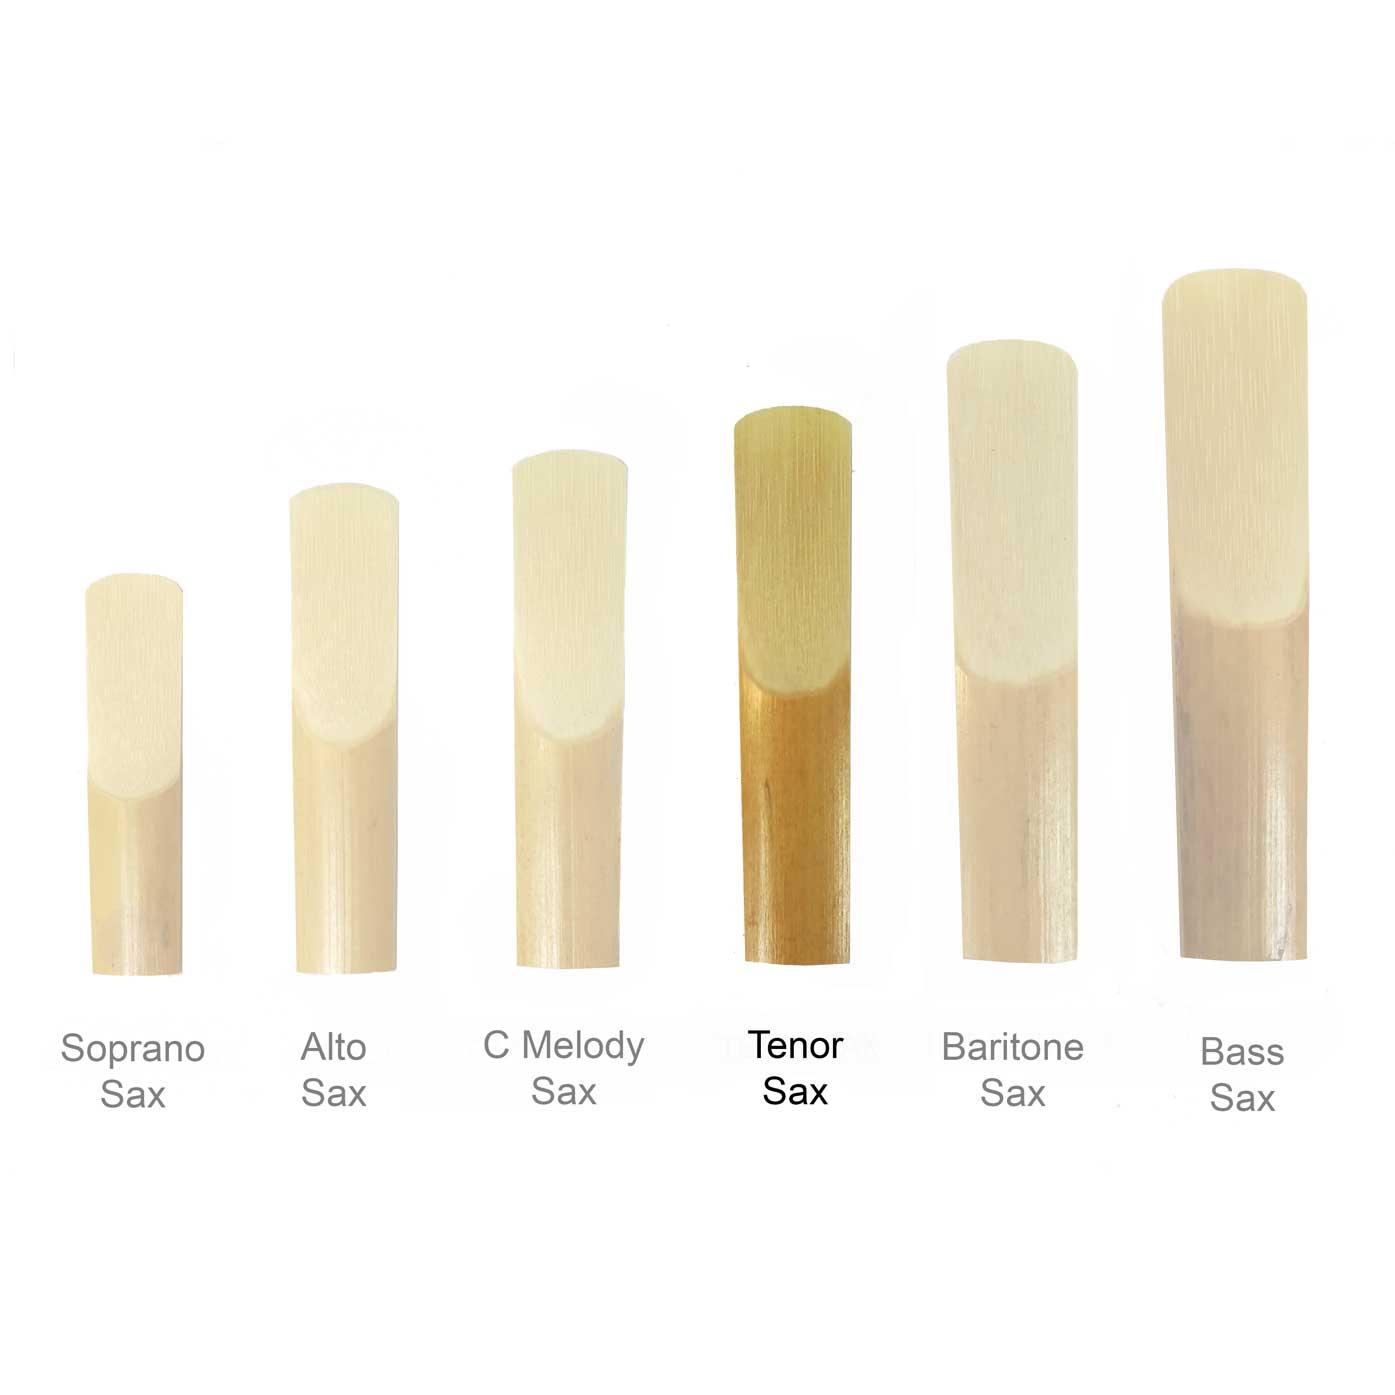 Maccaferri-Sax-Reeds-All-Sizes-tenor-sax.jpg